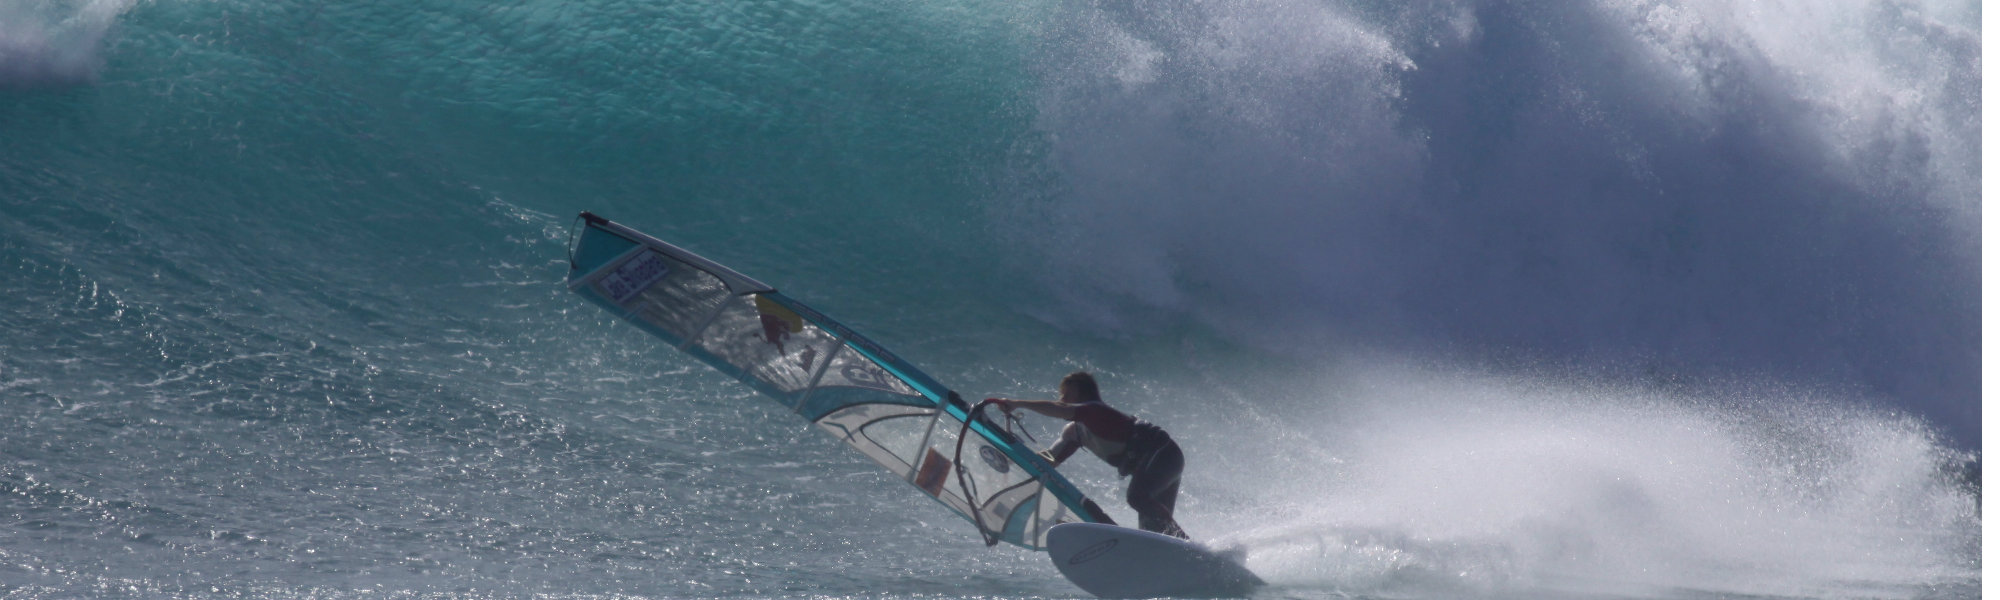 Bjørn Dunkerbeck on tour, windsurfing, Stand Up Paddle